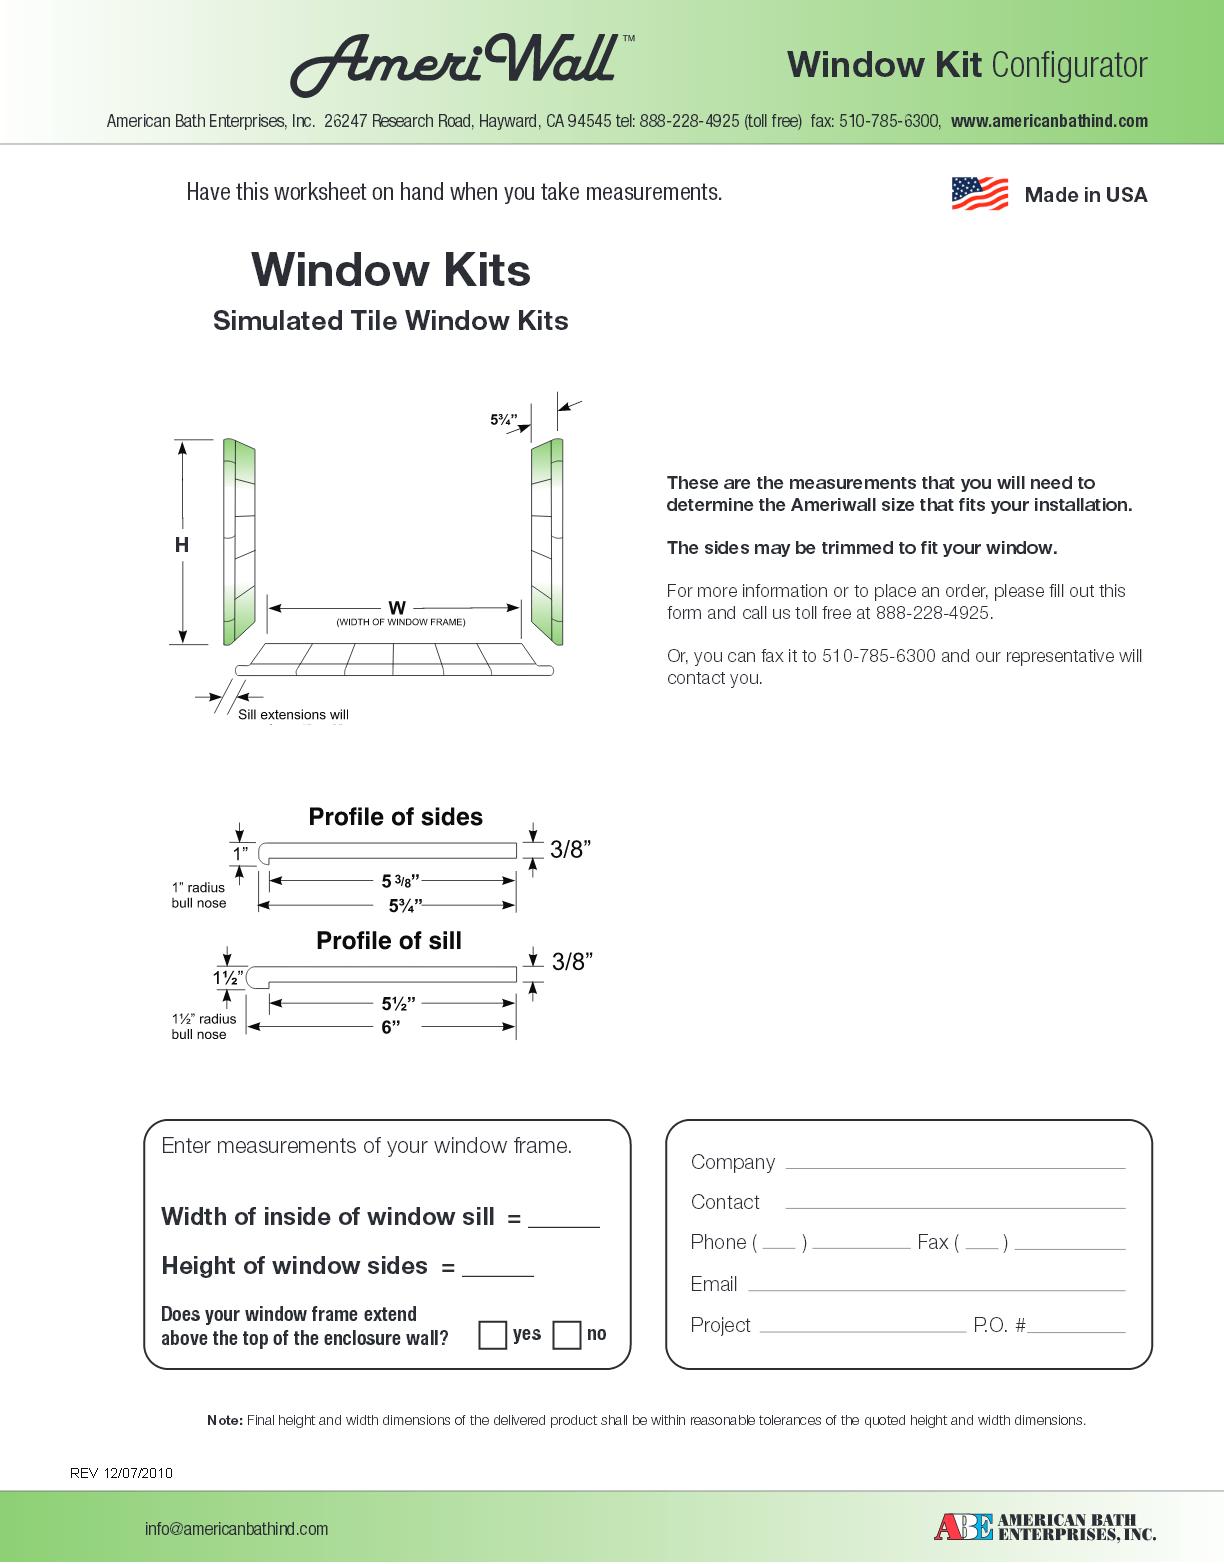 Ameriwall window kit